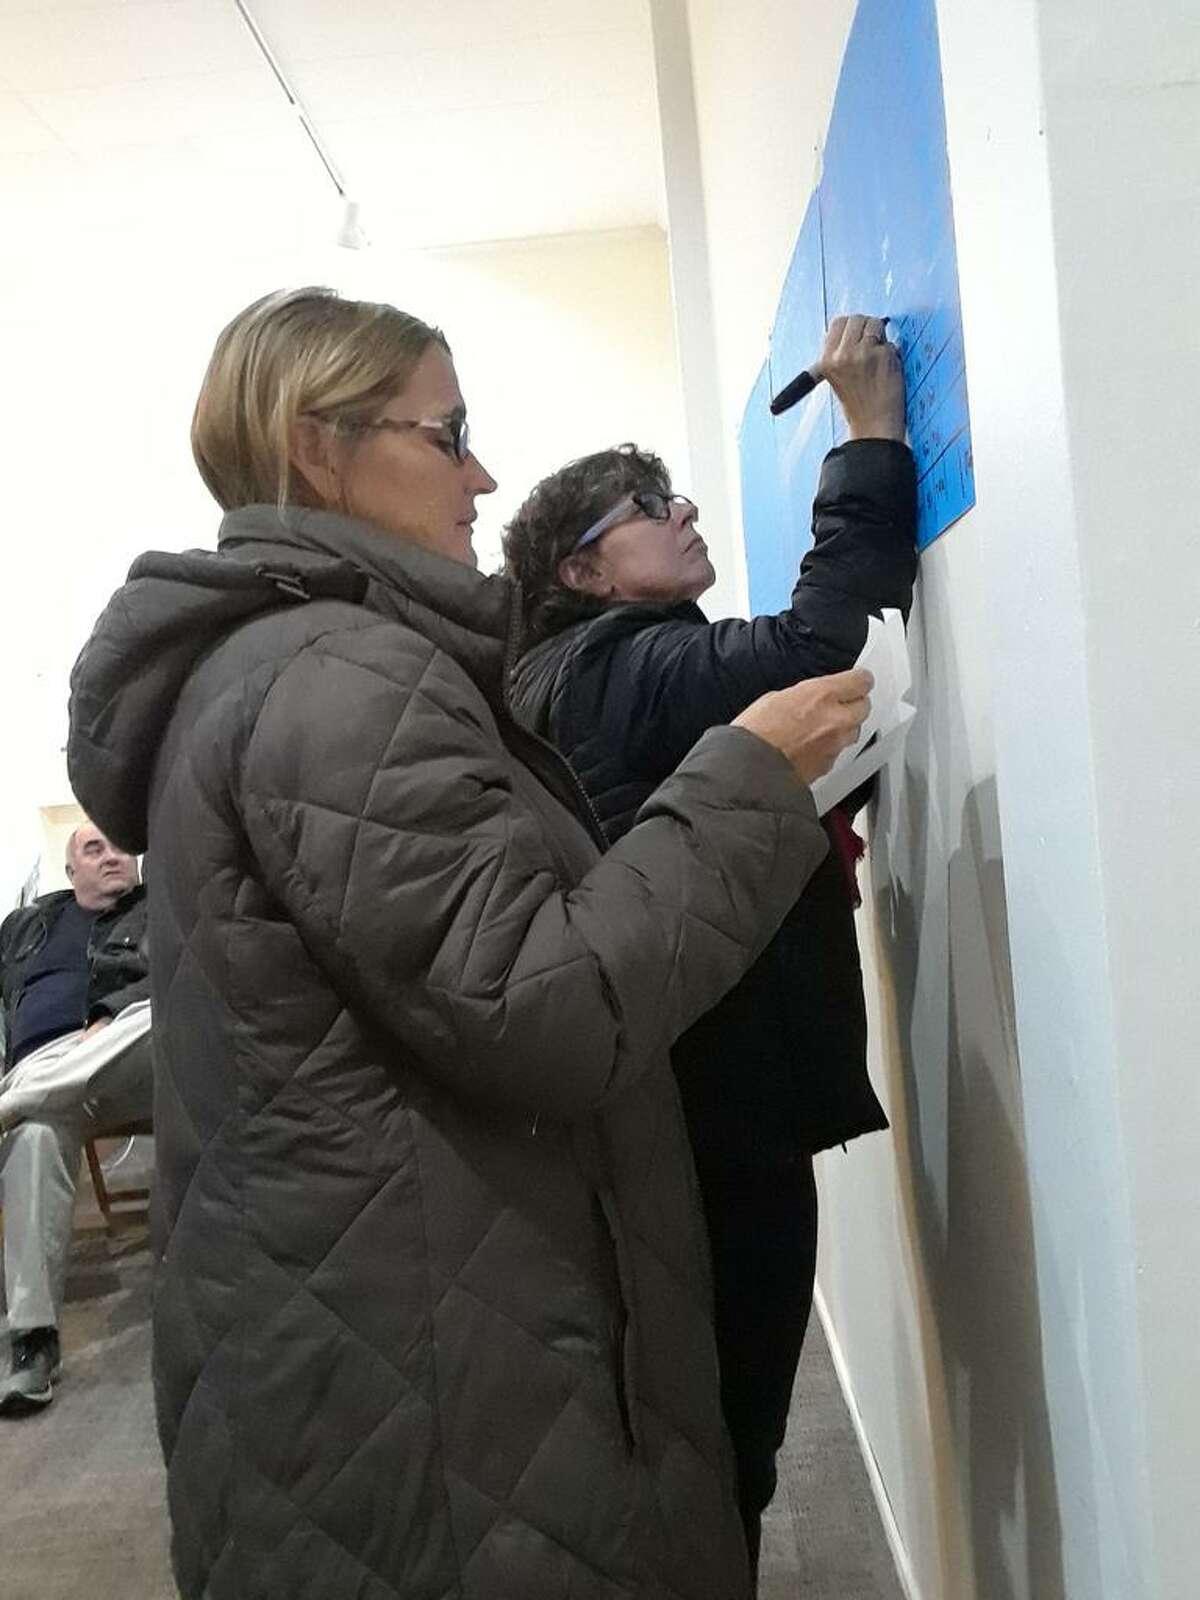 Democrat Ellen Hoehne writes voter returns as they are read to her by school board member and incumbent Democrat Fiona Cappabianca.